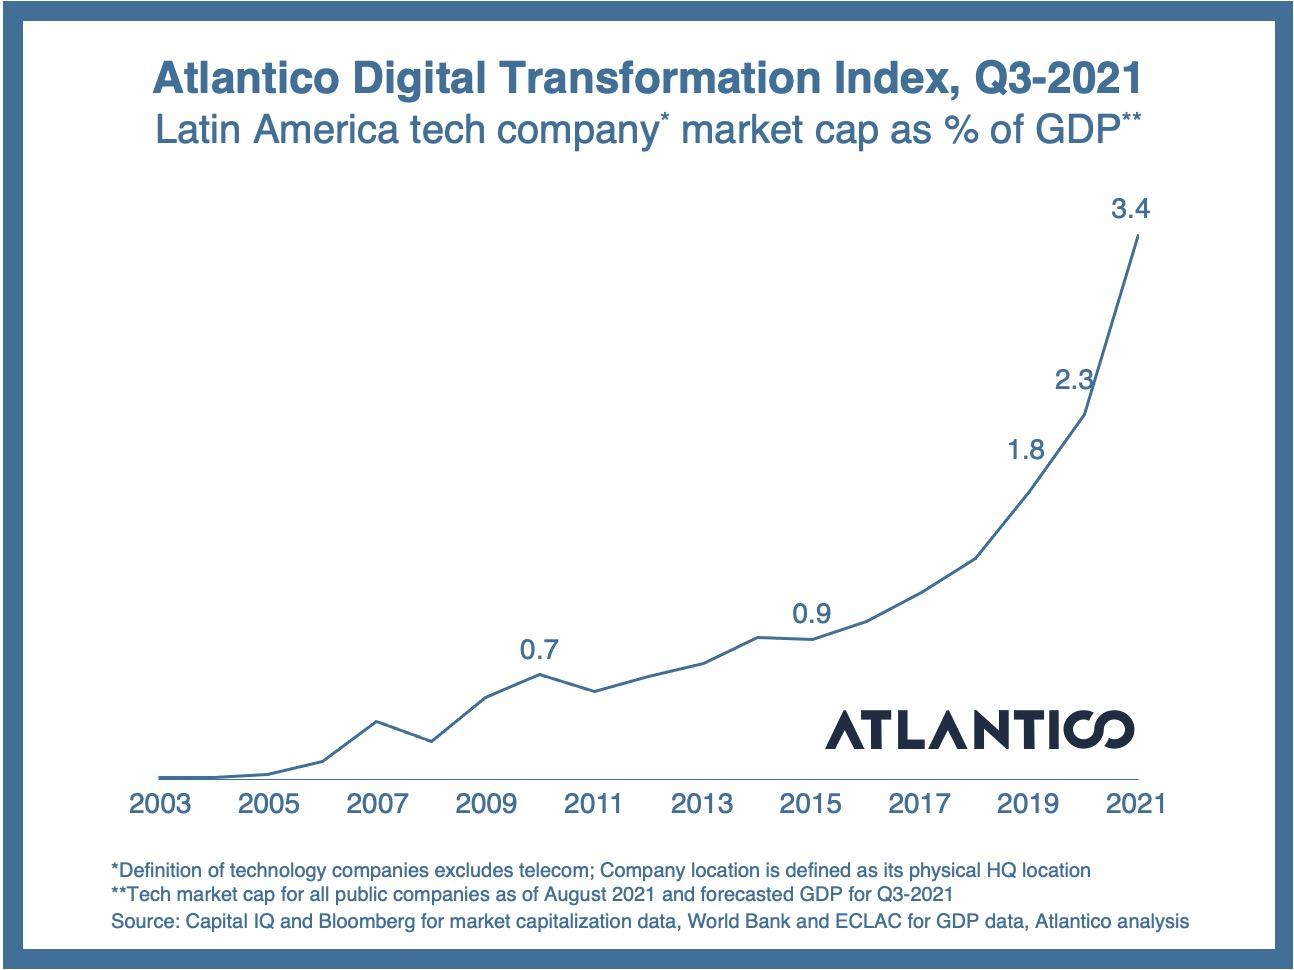 Atlantico Digital Transformation Index 2021 LatAm.